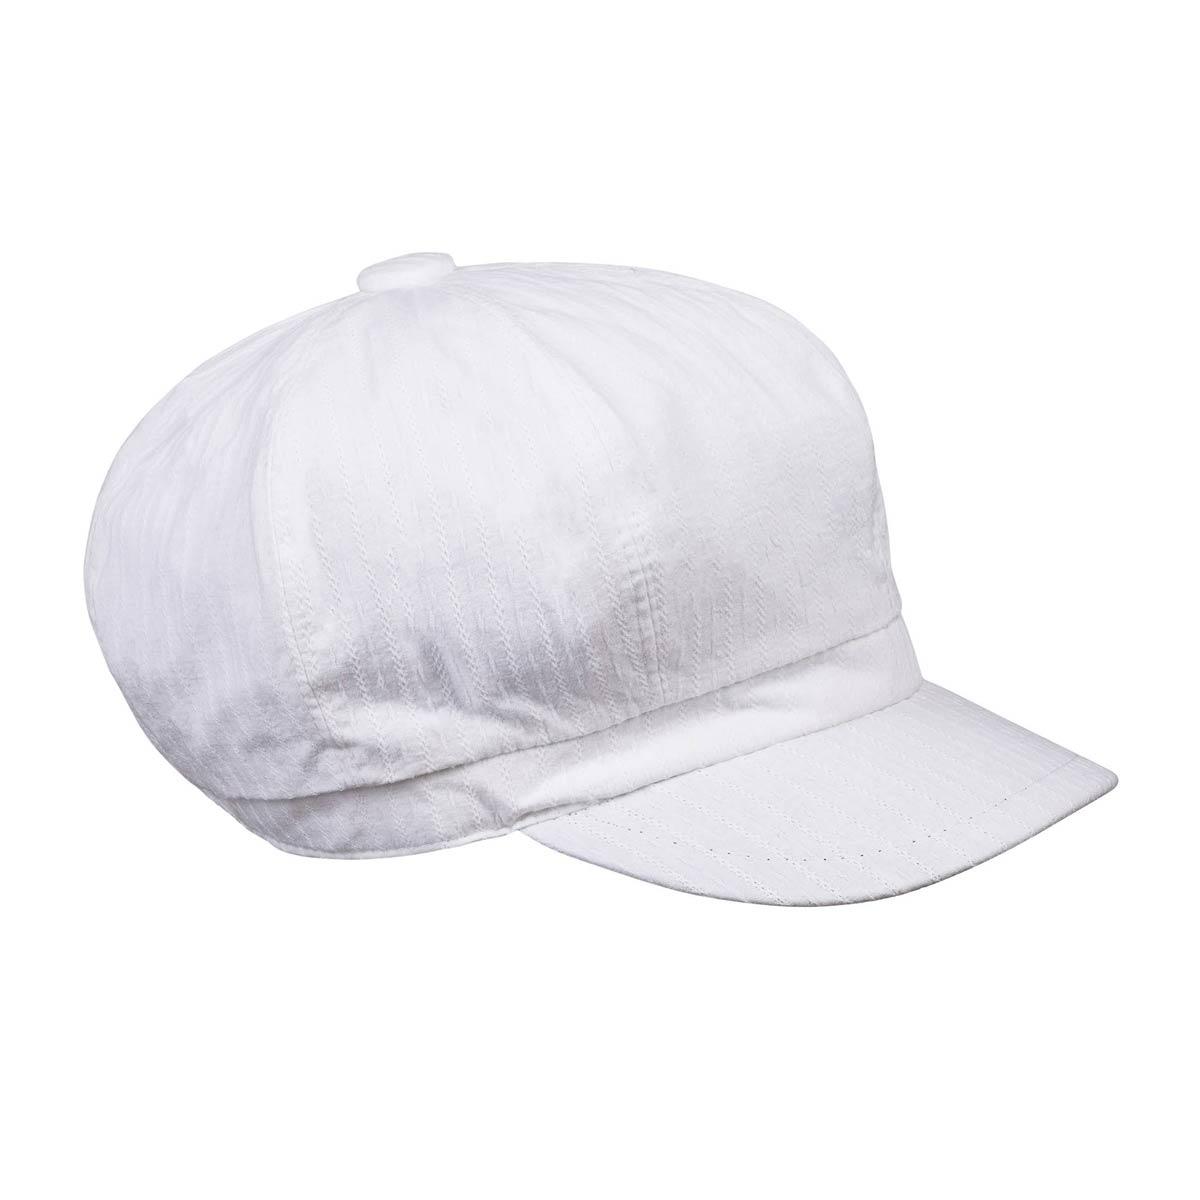 CP-01627_F12-1--_casquette-femme-gavroche-blanche